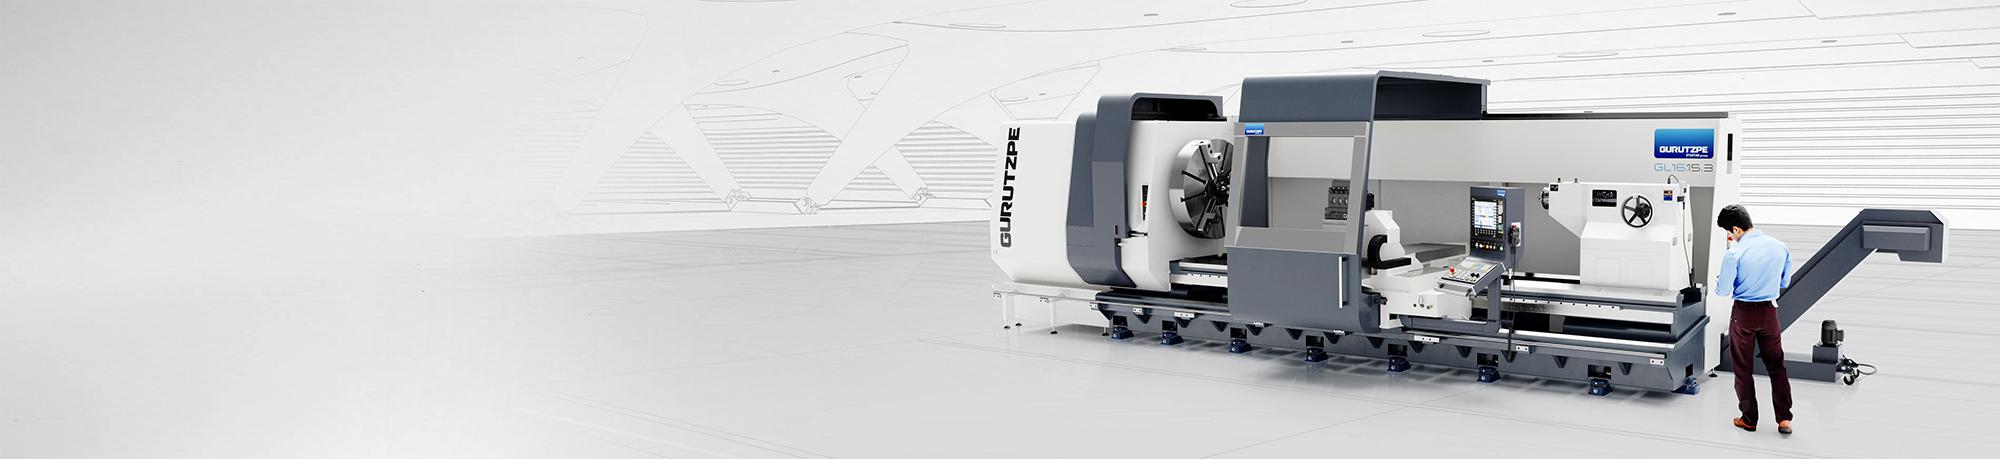 serie-gl-horizontal-lathe-heavy-duty-slider